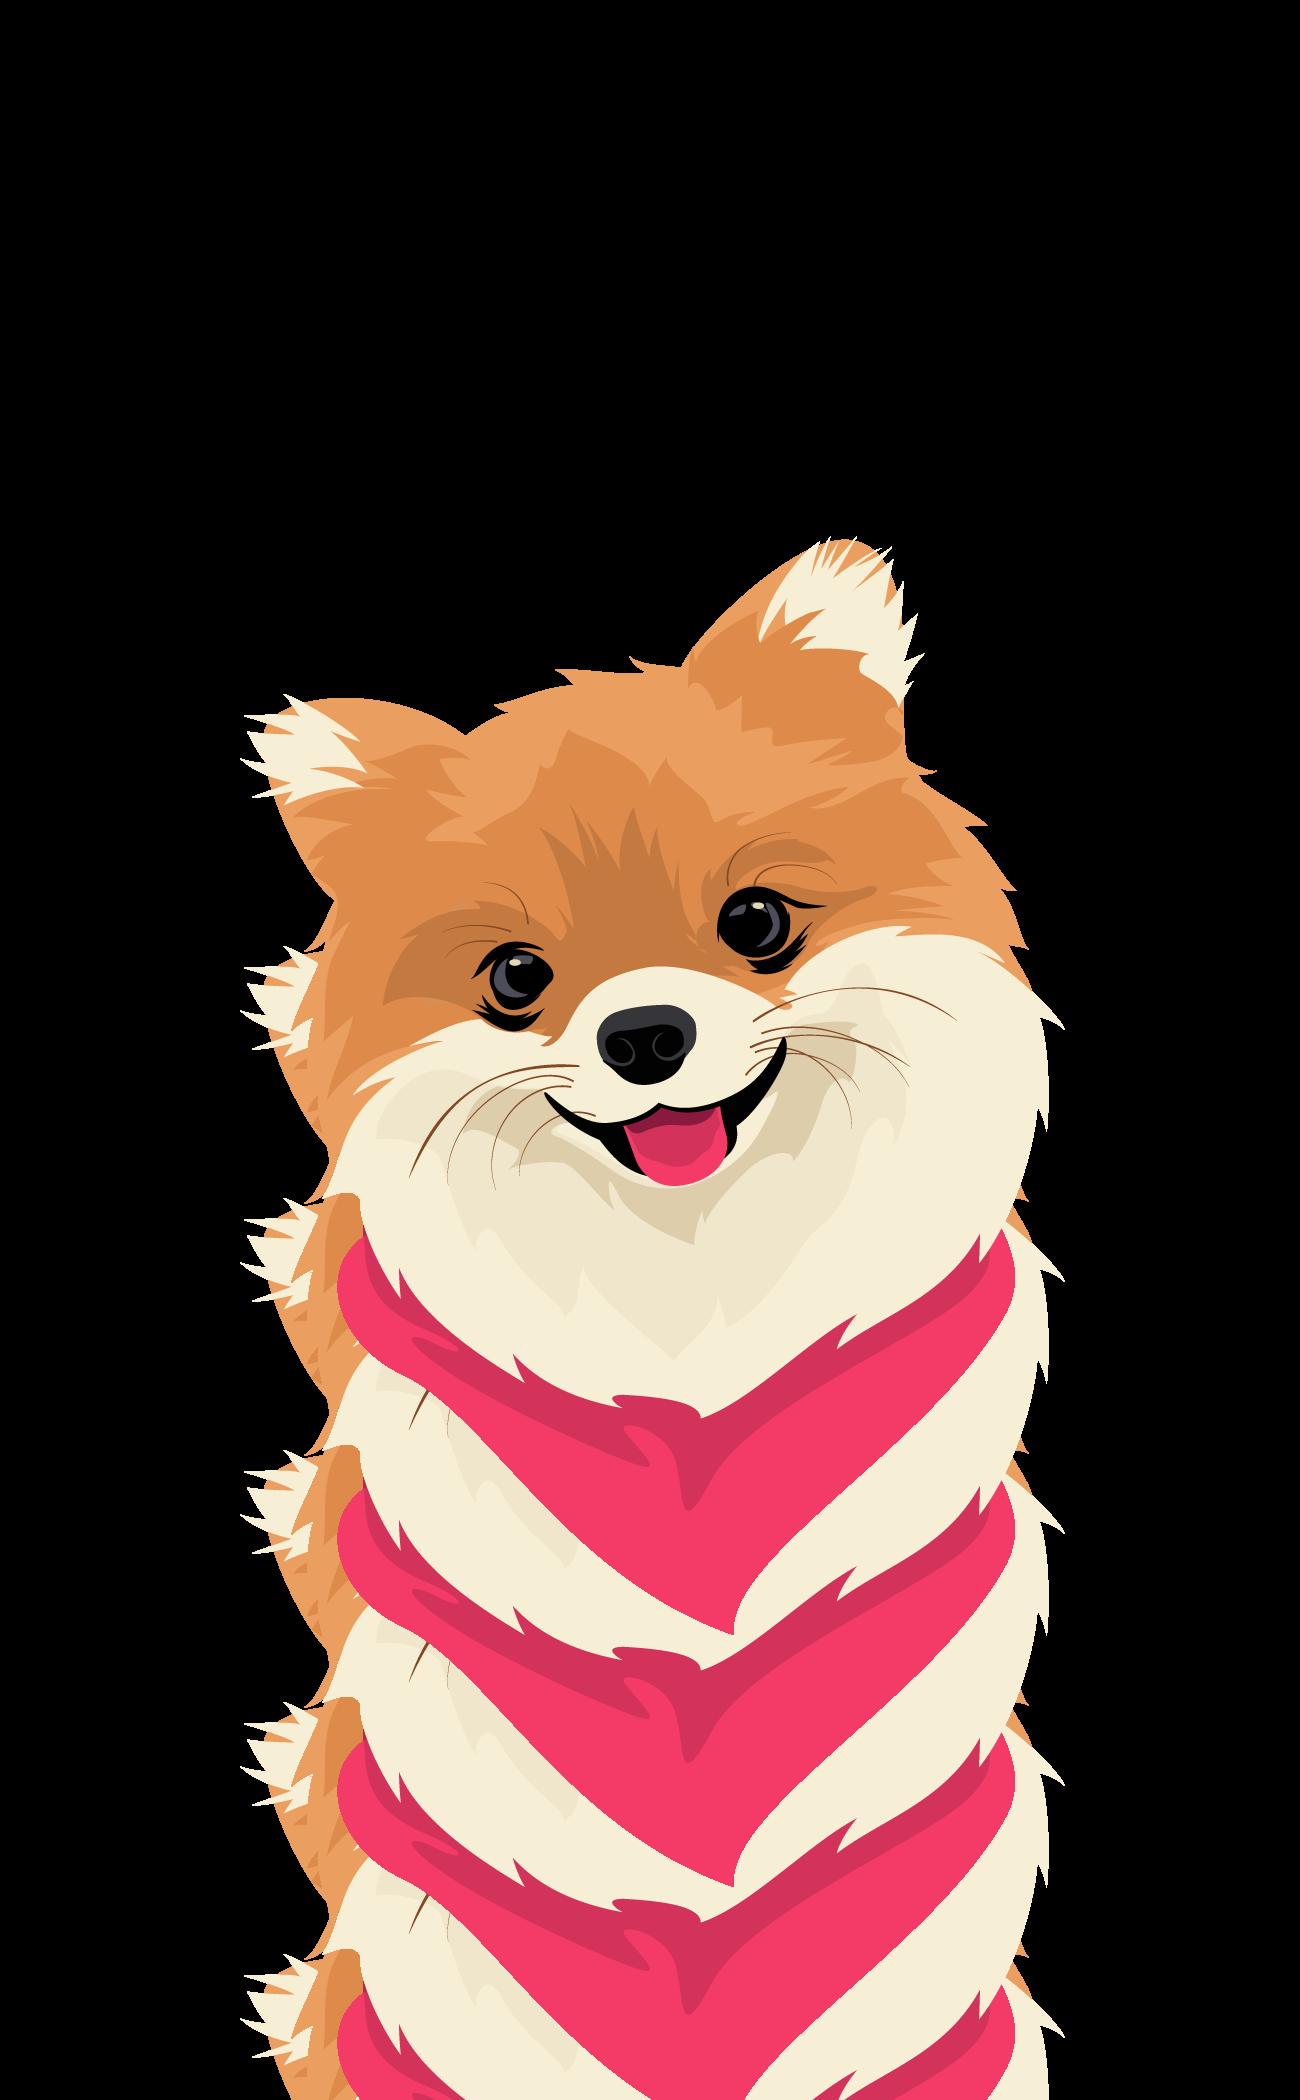 Casetify Cute Dogs Ideas Art Wallpaper Dog Wallpaper Iphone Cute Dog Cartoon Dog Illustration